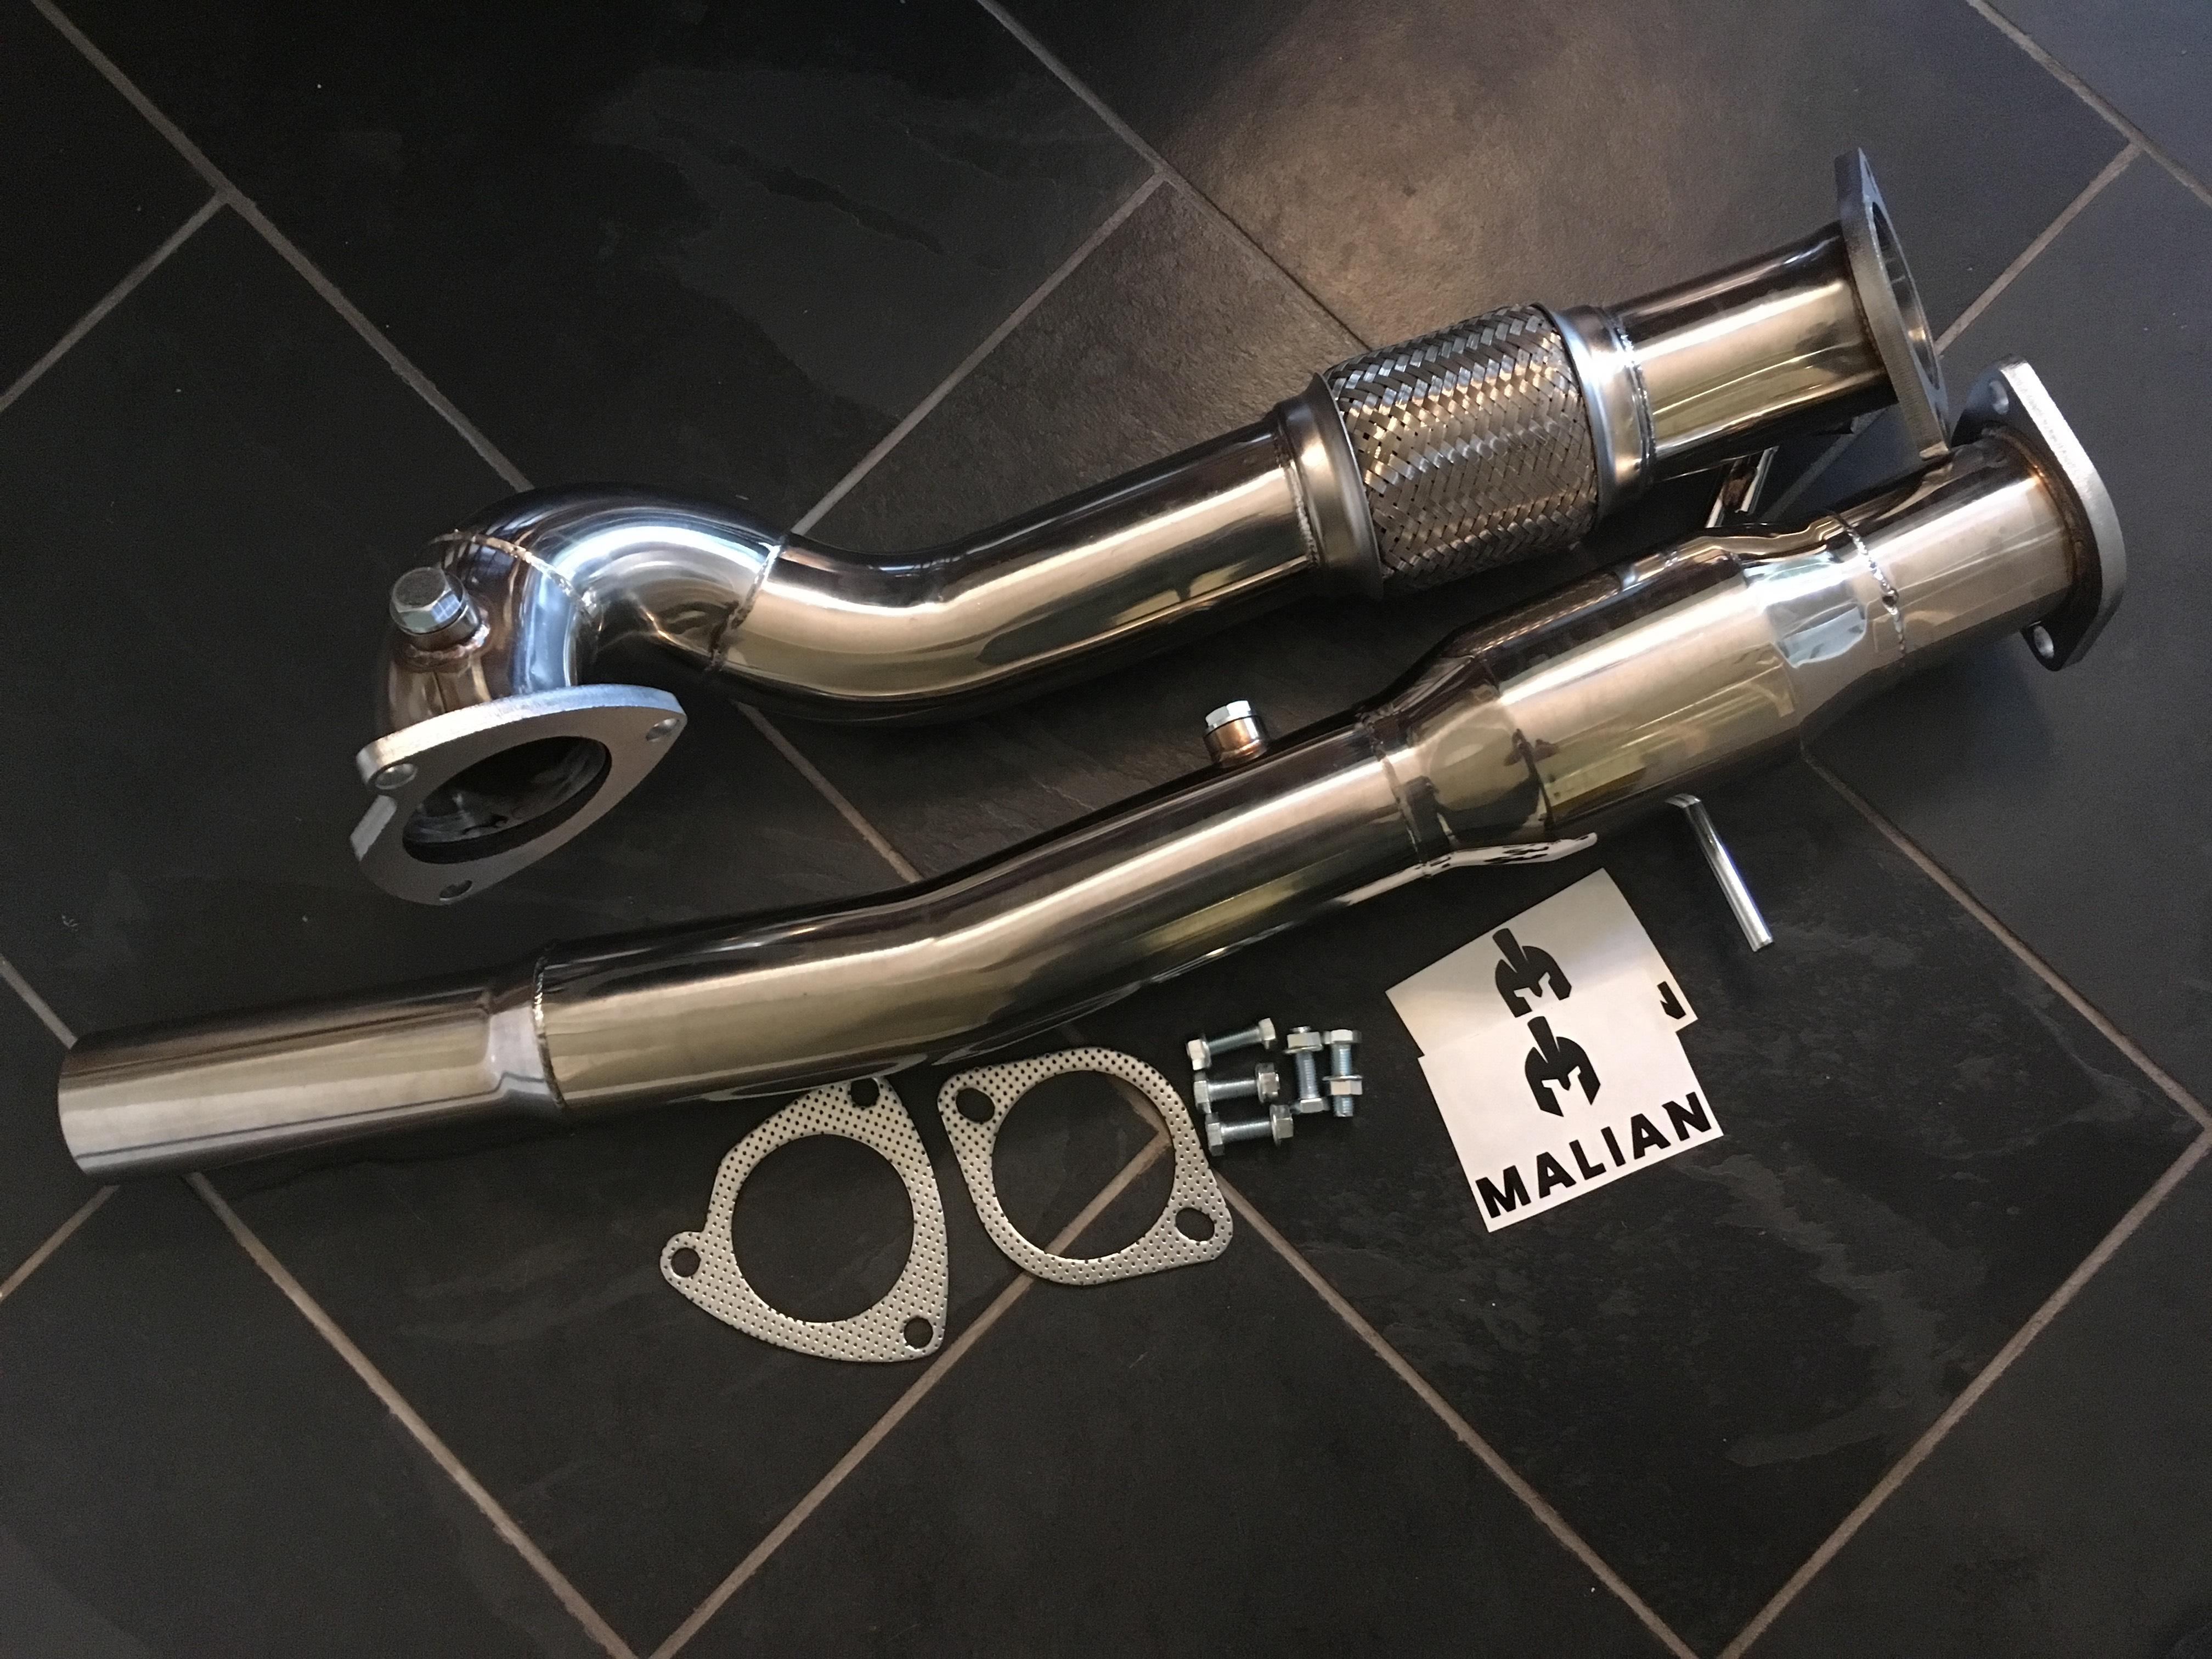 Audi Tt 1 8t Quattro Or S3 225 Performance Exhaust 3 Downpipe